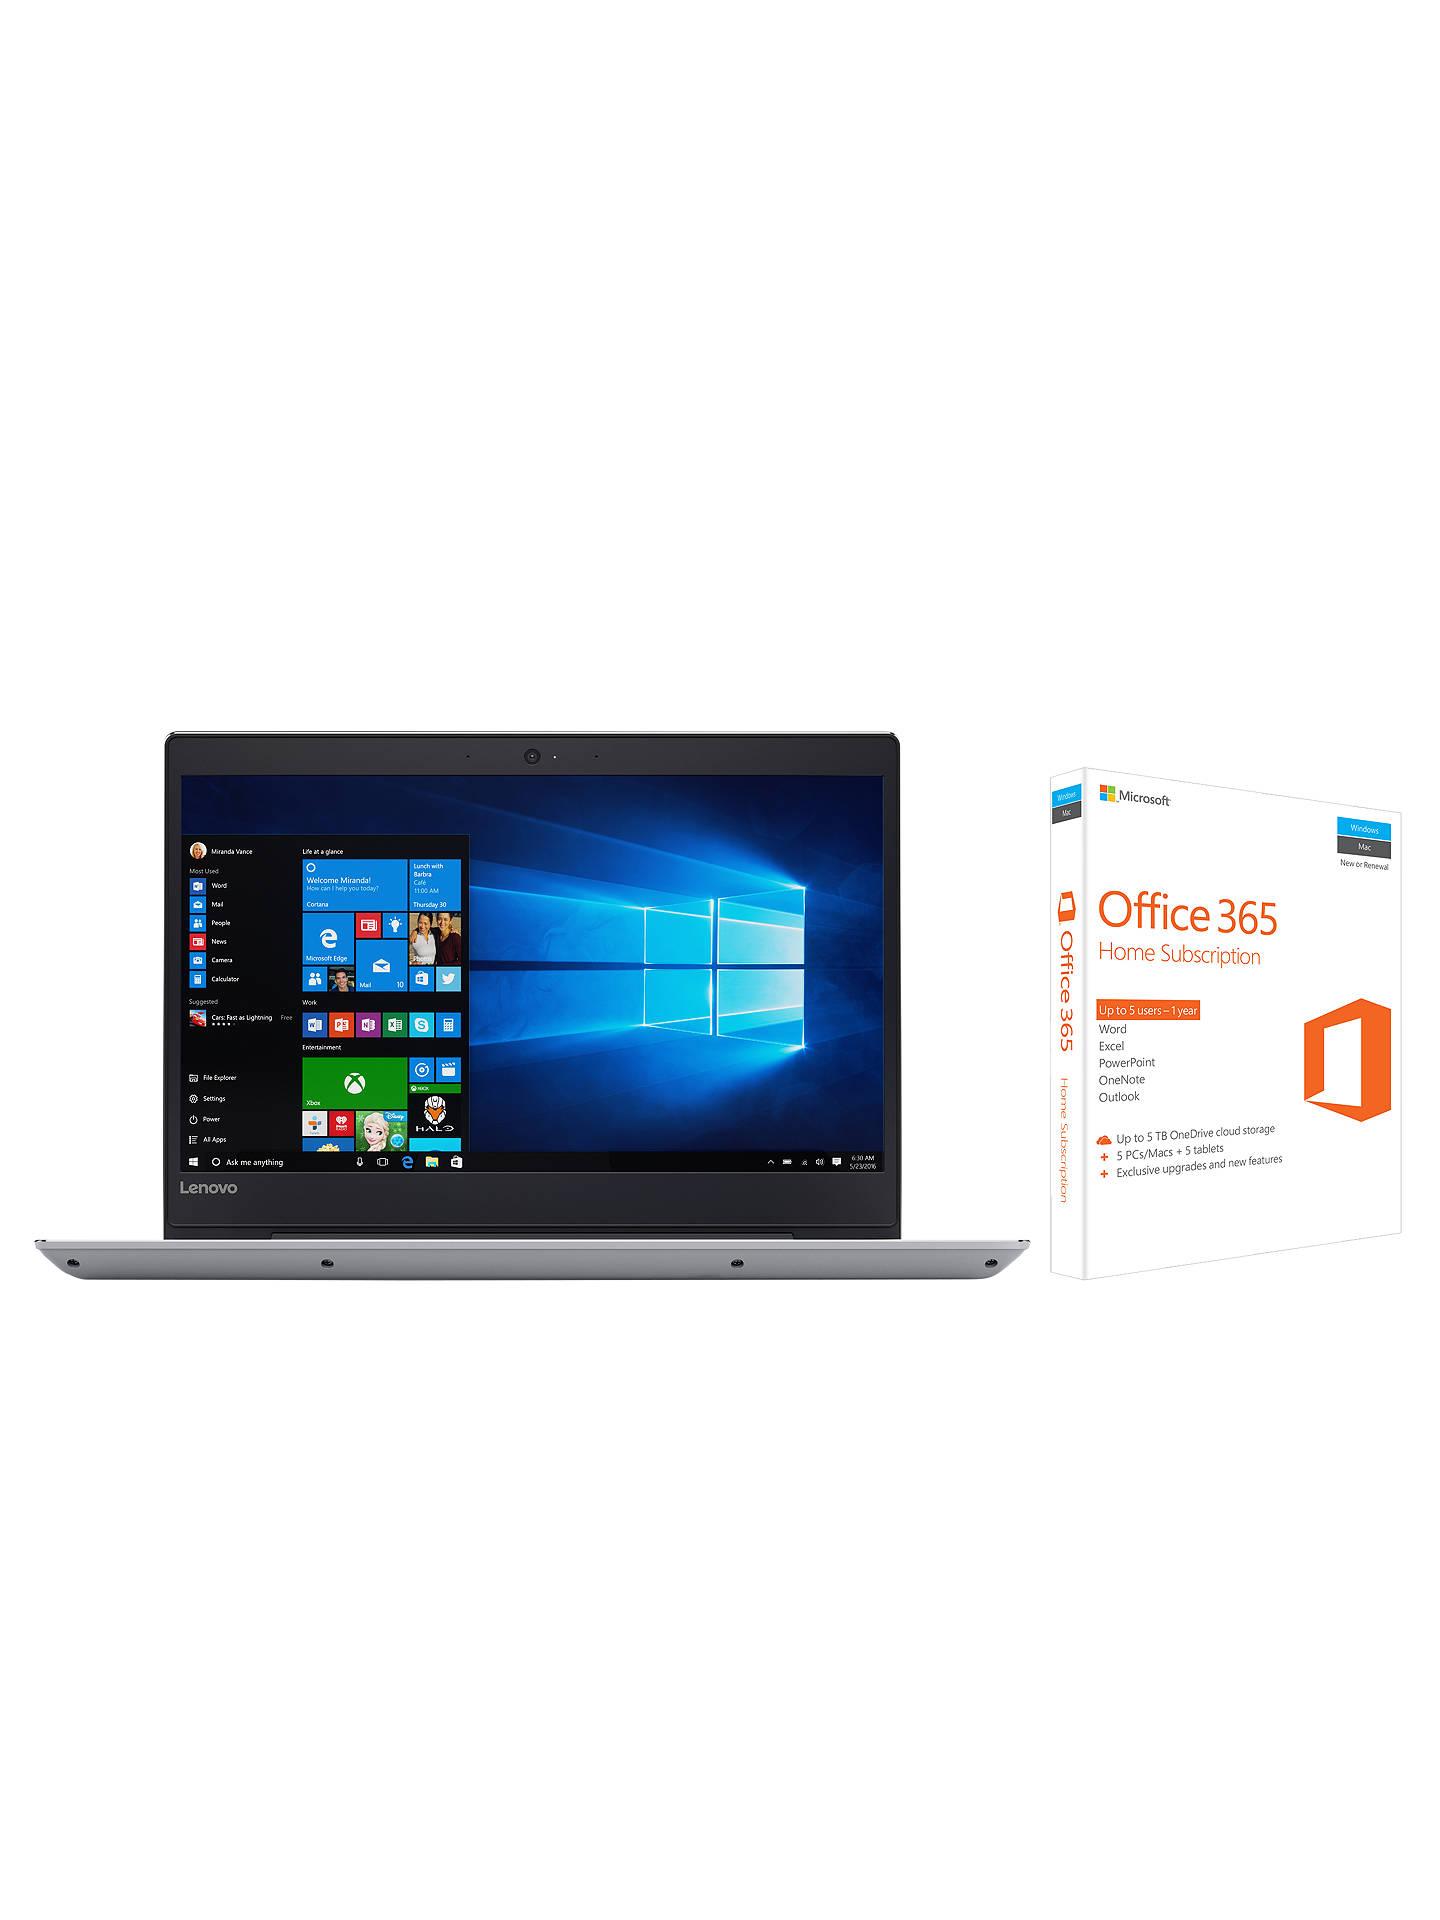 Lenovo IdeaPad 520S Laptop, Intel Core i5, 8GB, 128GB SSD